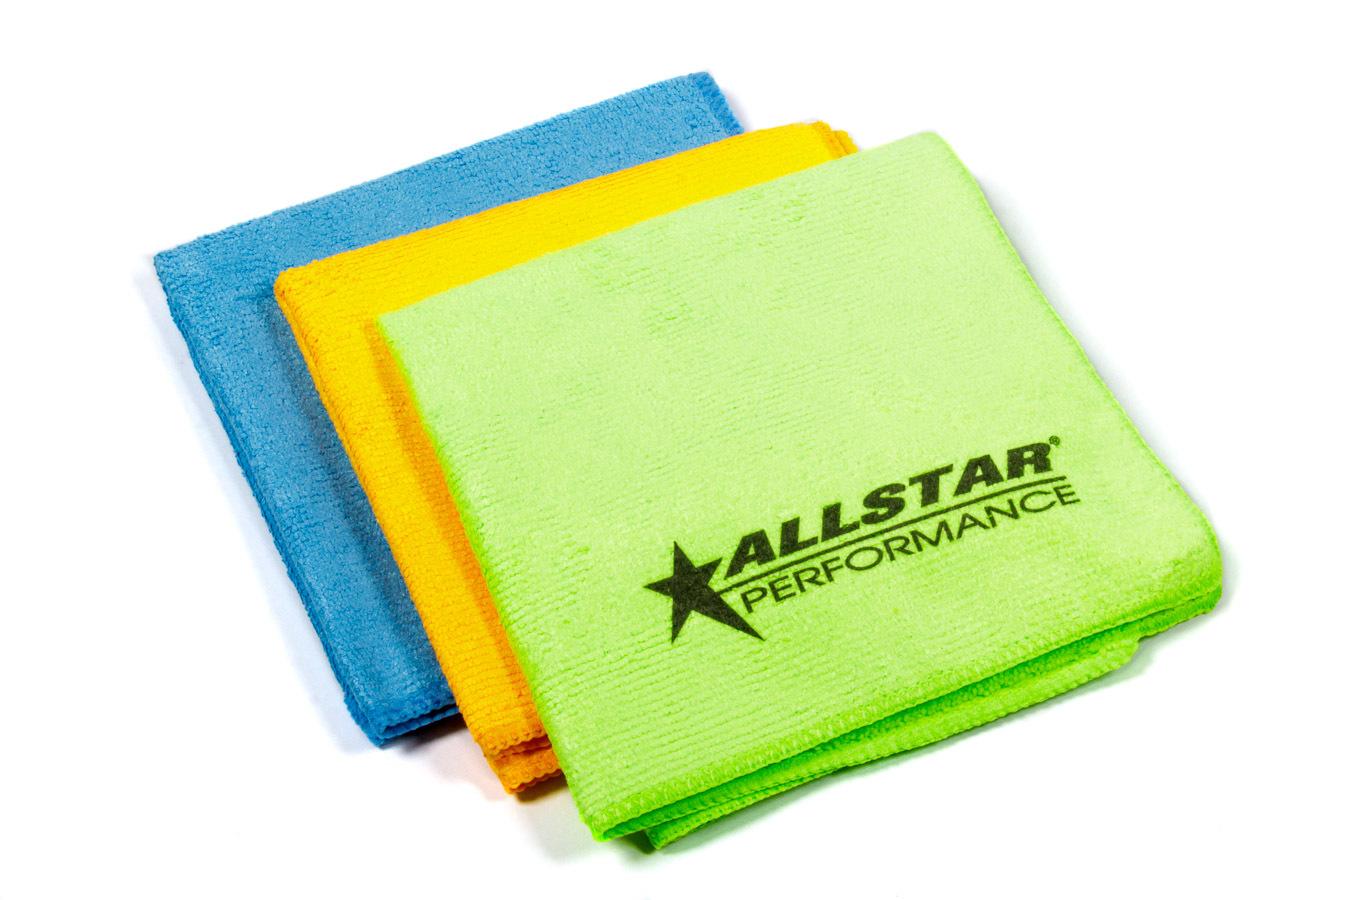 Allstar Performance Microfiber Towels 3pk 12in x 12in